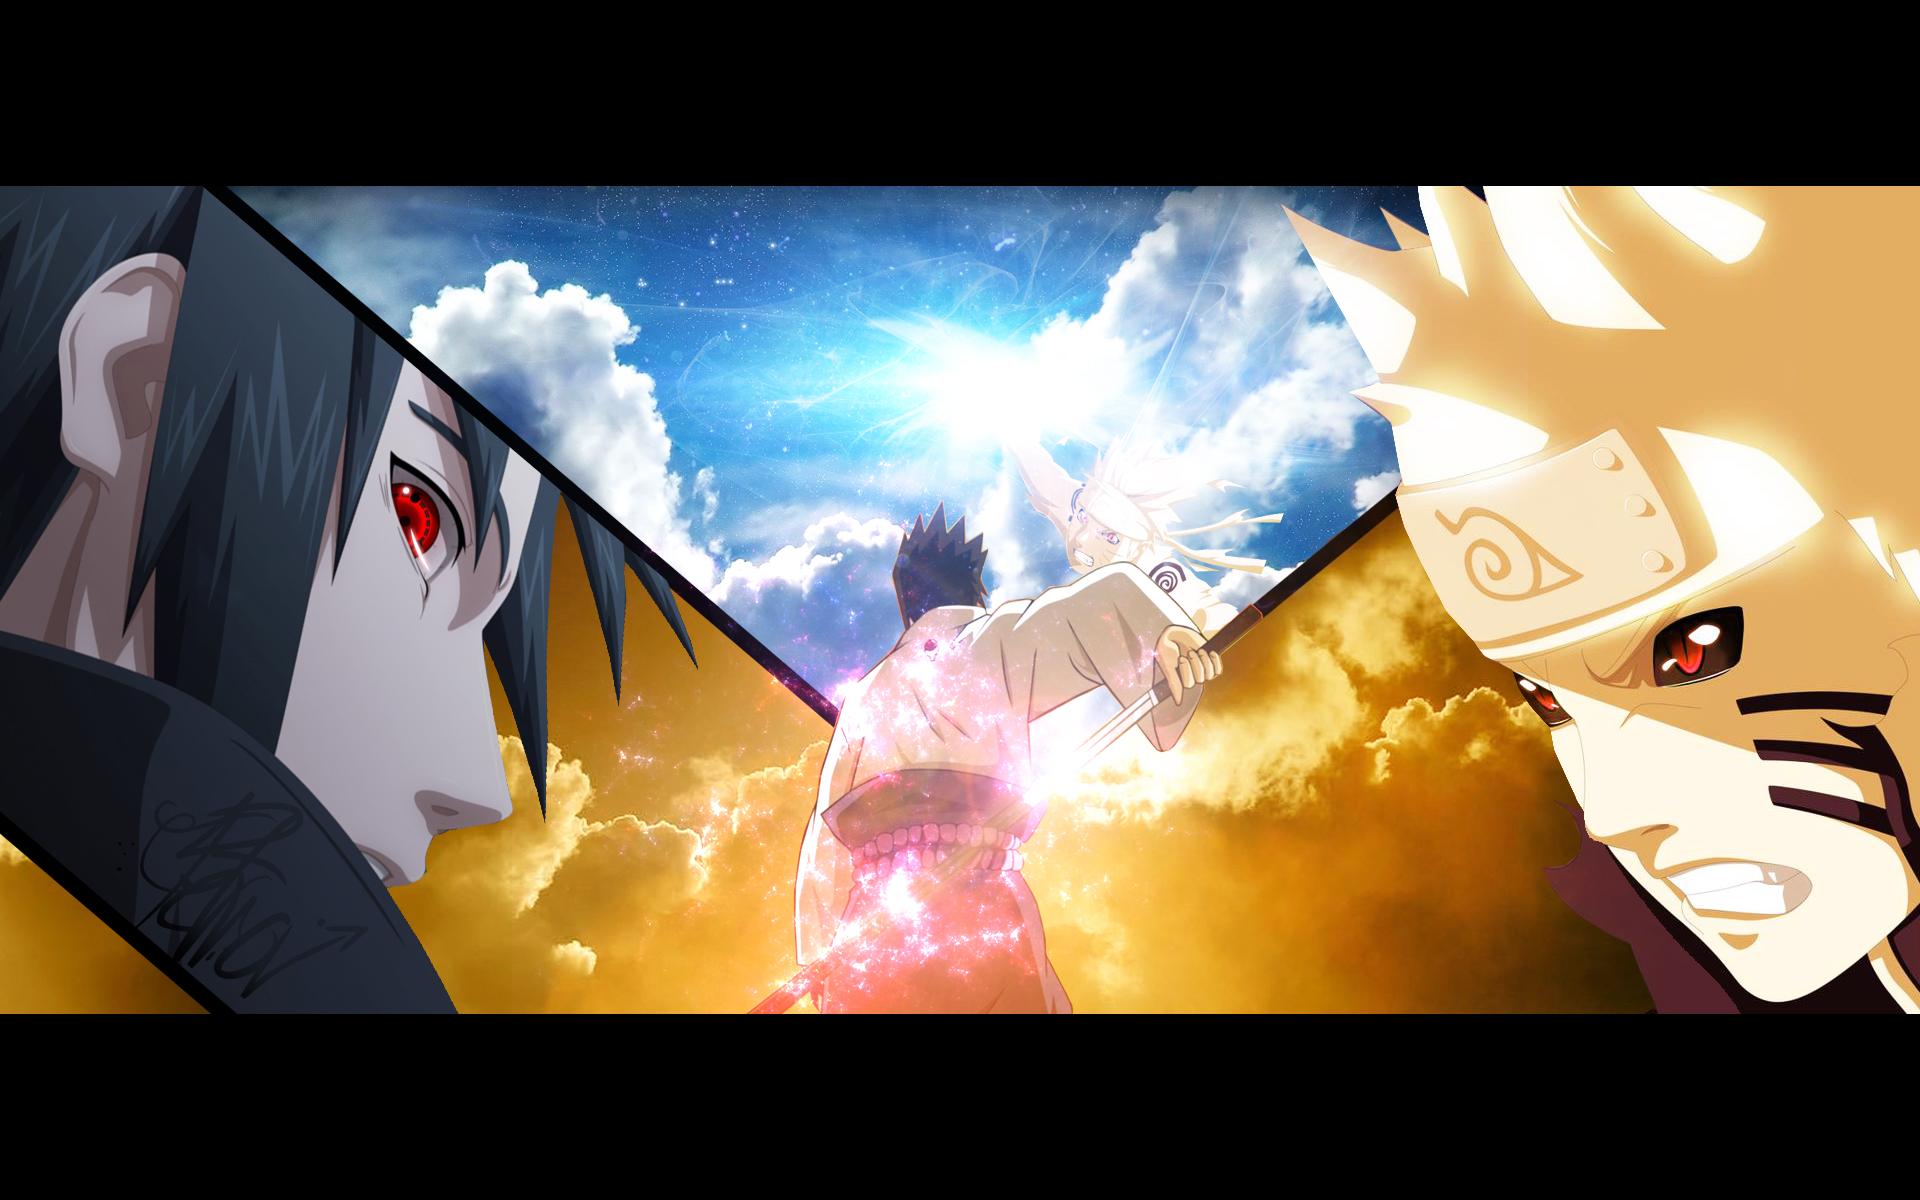 Naruto Vs Sasuke Wallpapers   wallpaper, wallpaper hd, background ...